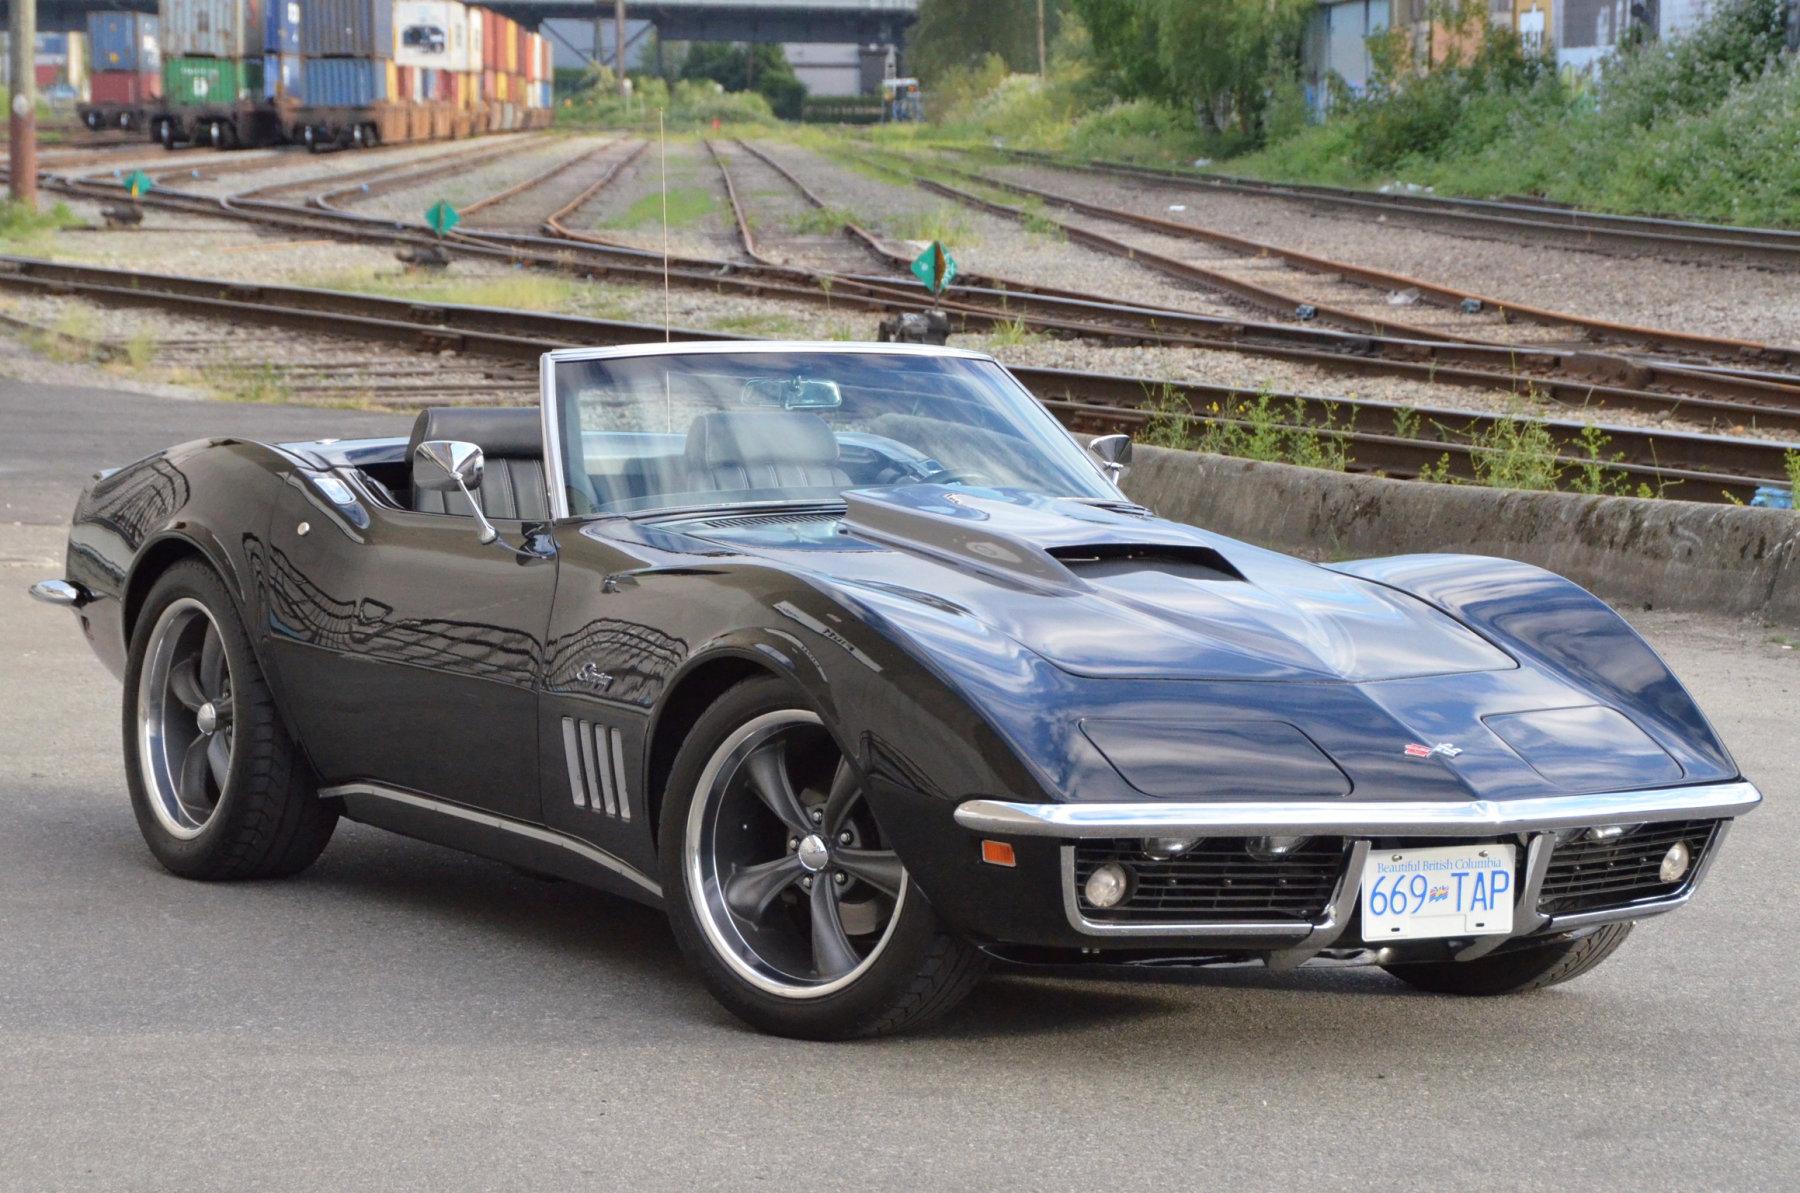 '69 Corvette Stingray Railroad Tracks